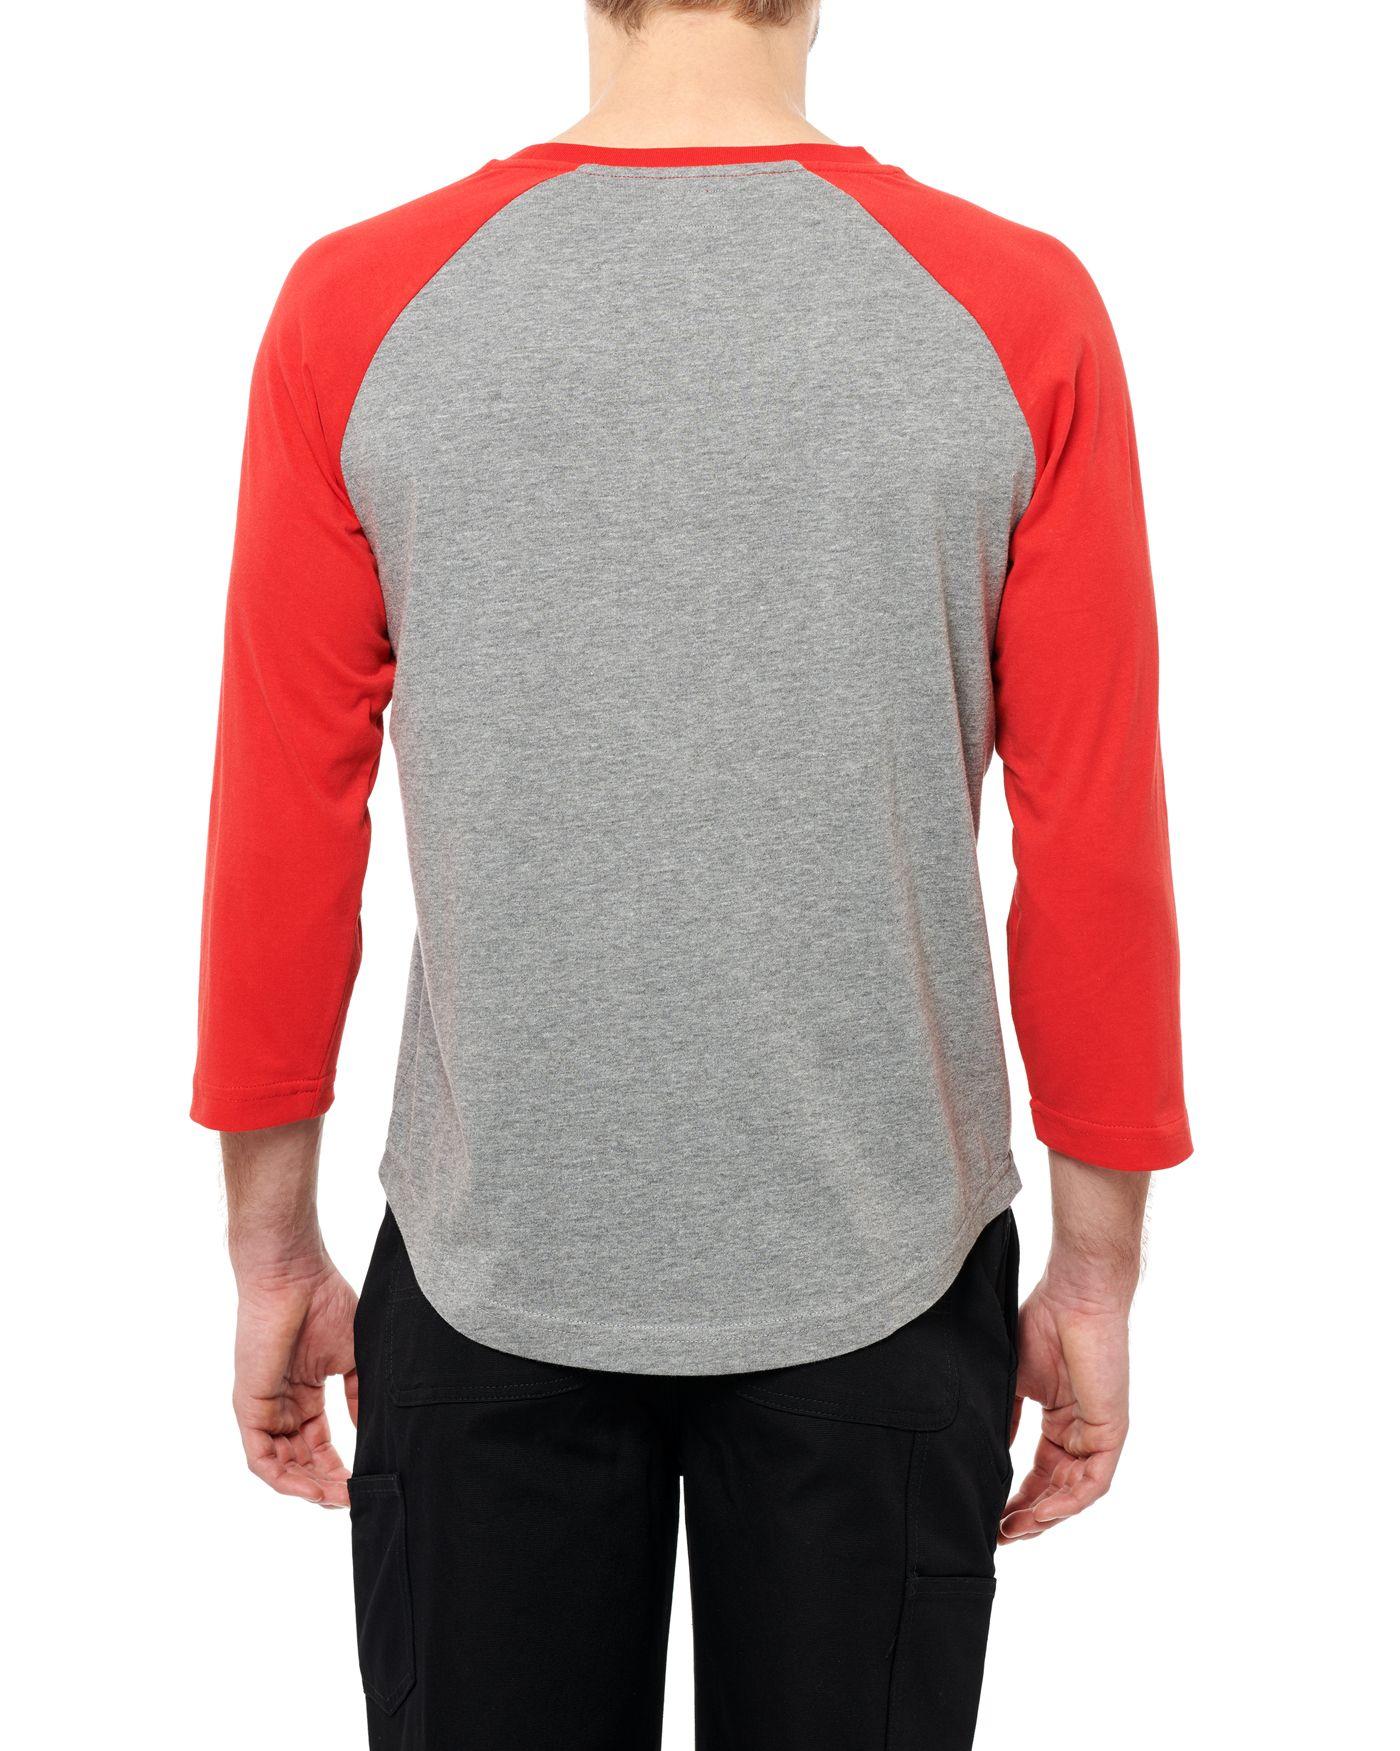 Photo of Wildcat 3/4 Raglan T-shirt, Grey Melange